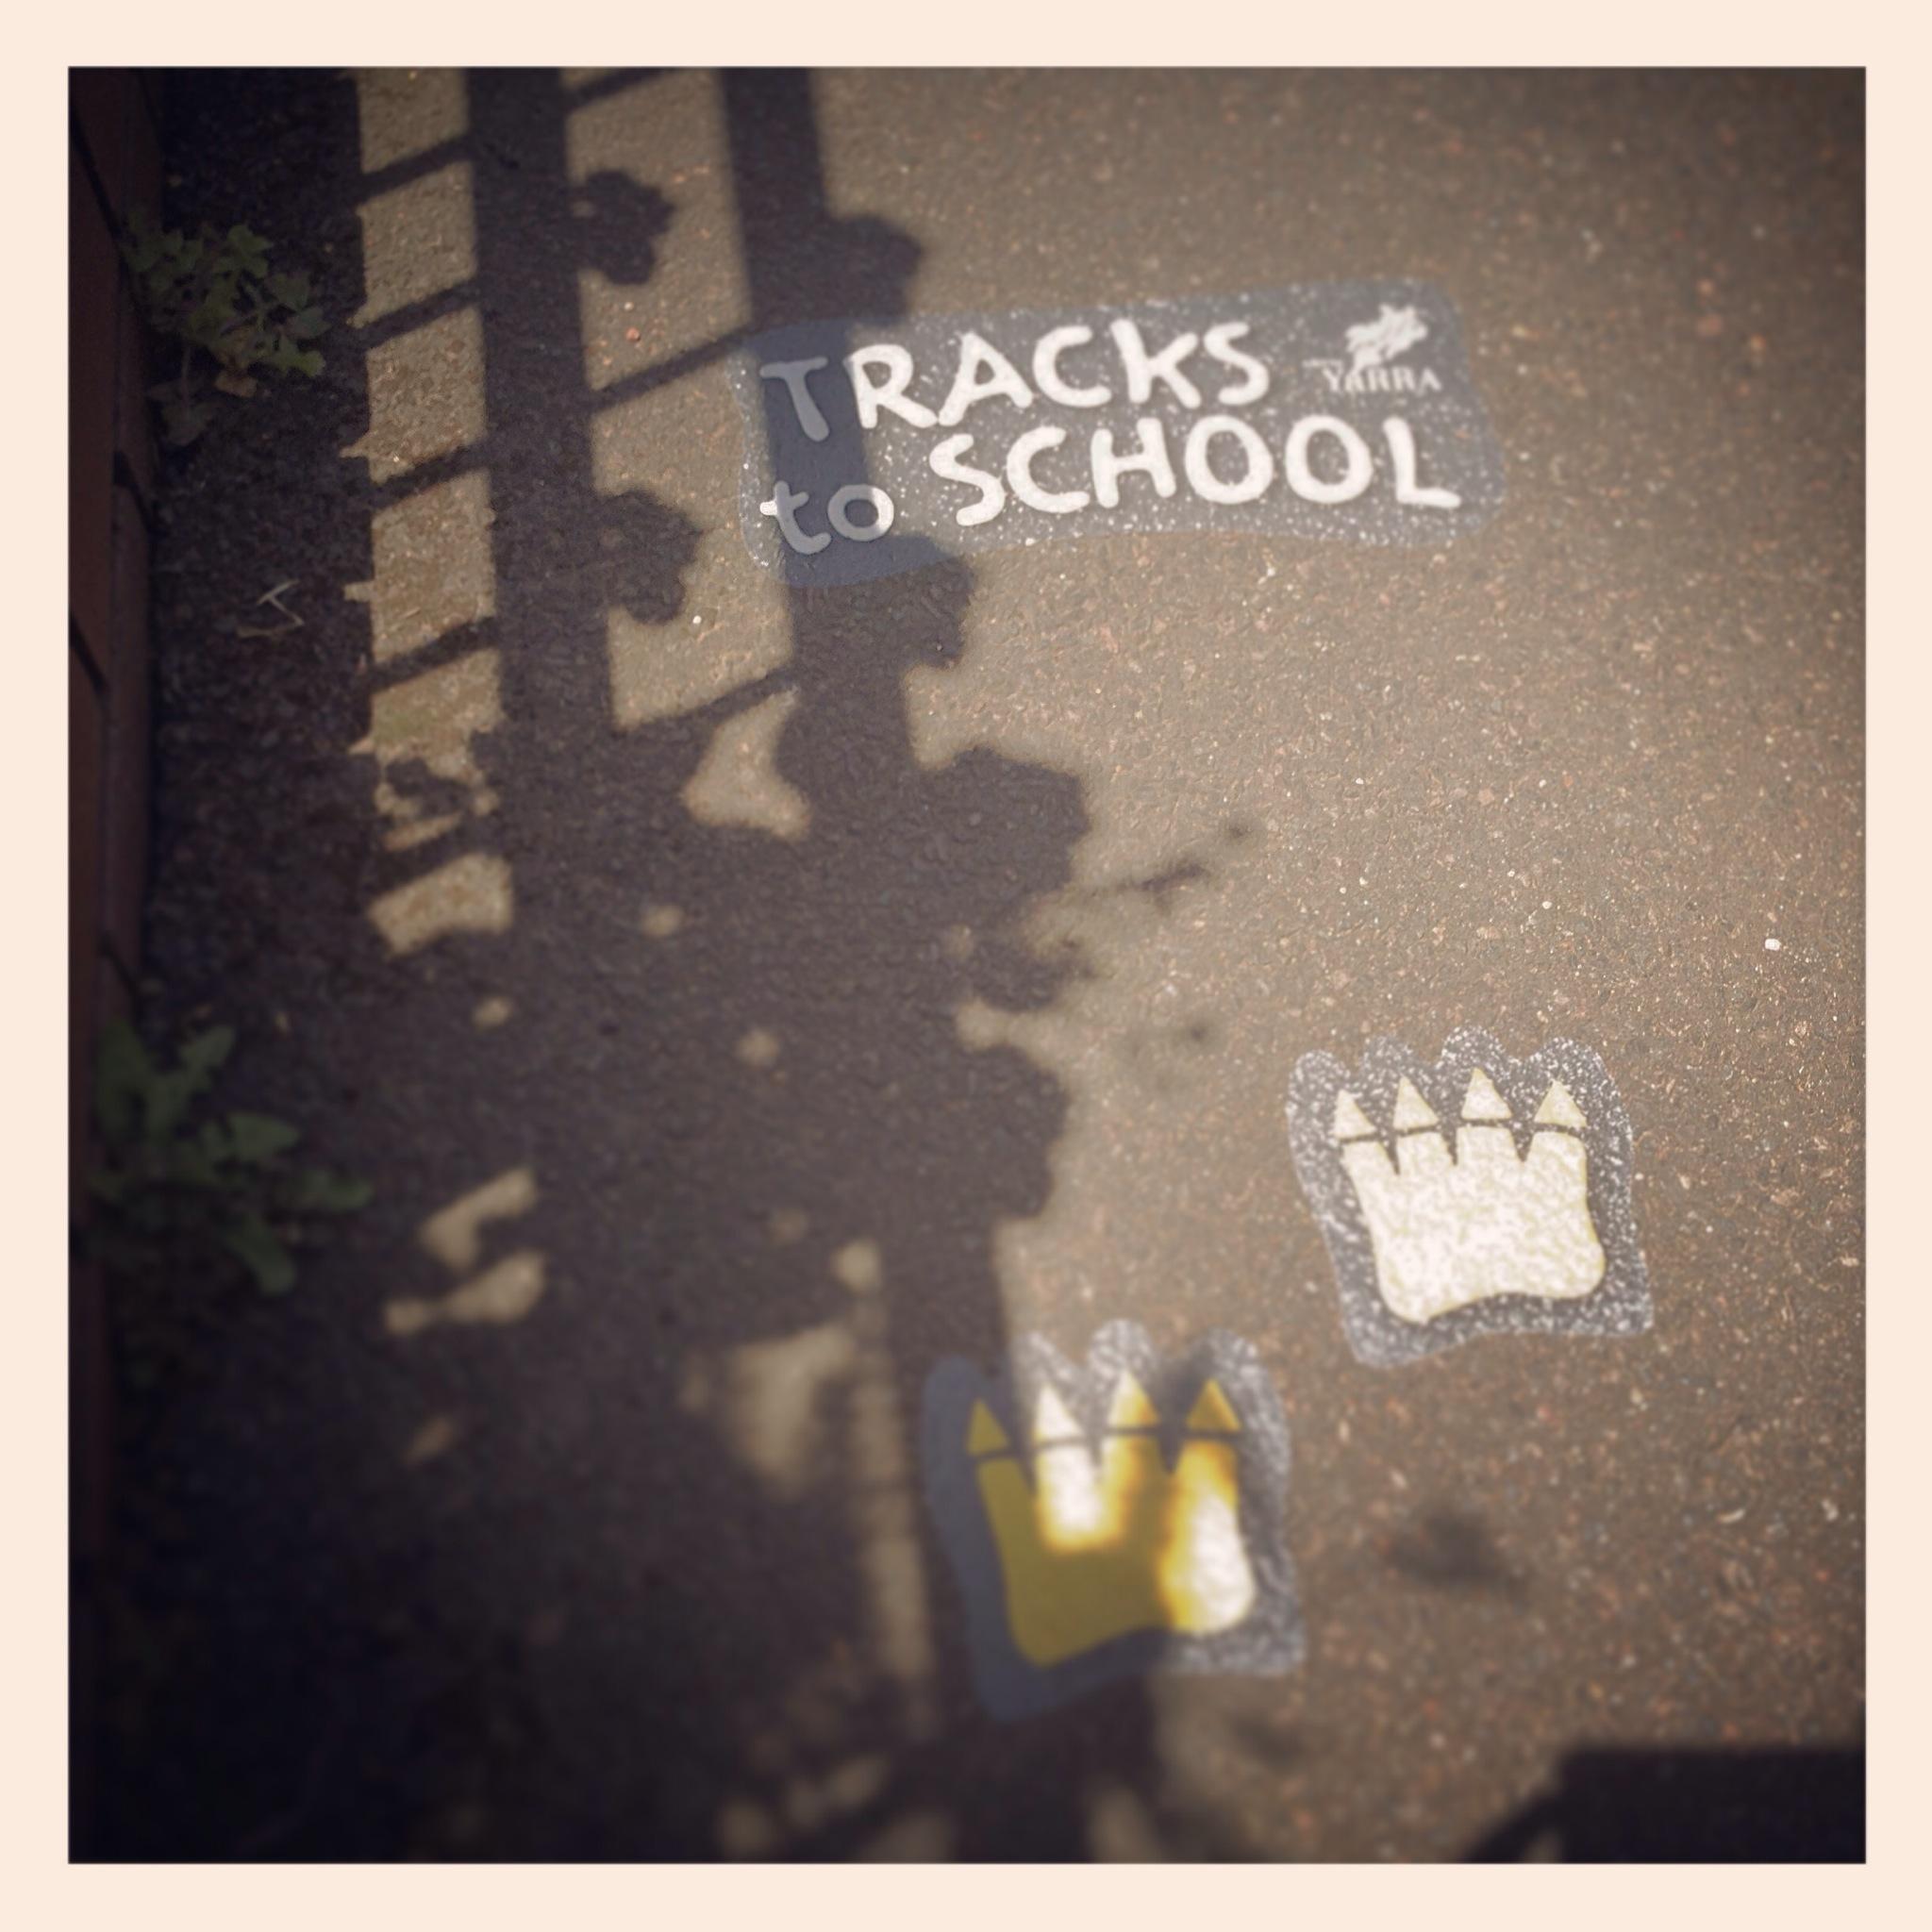 Day 1336. school tracks…